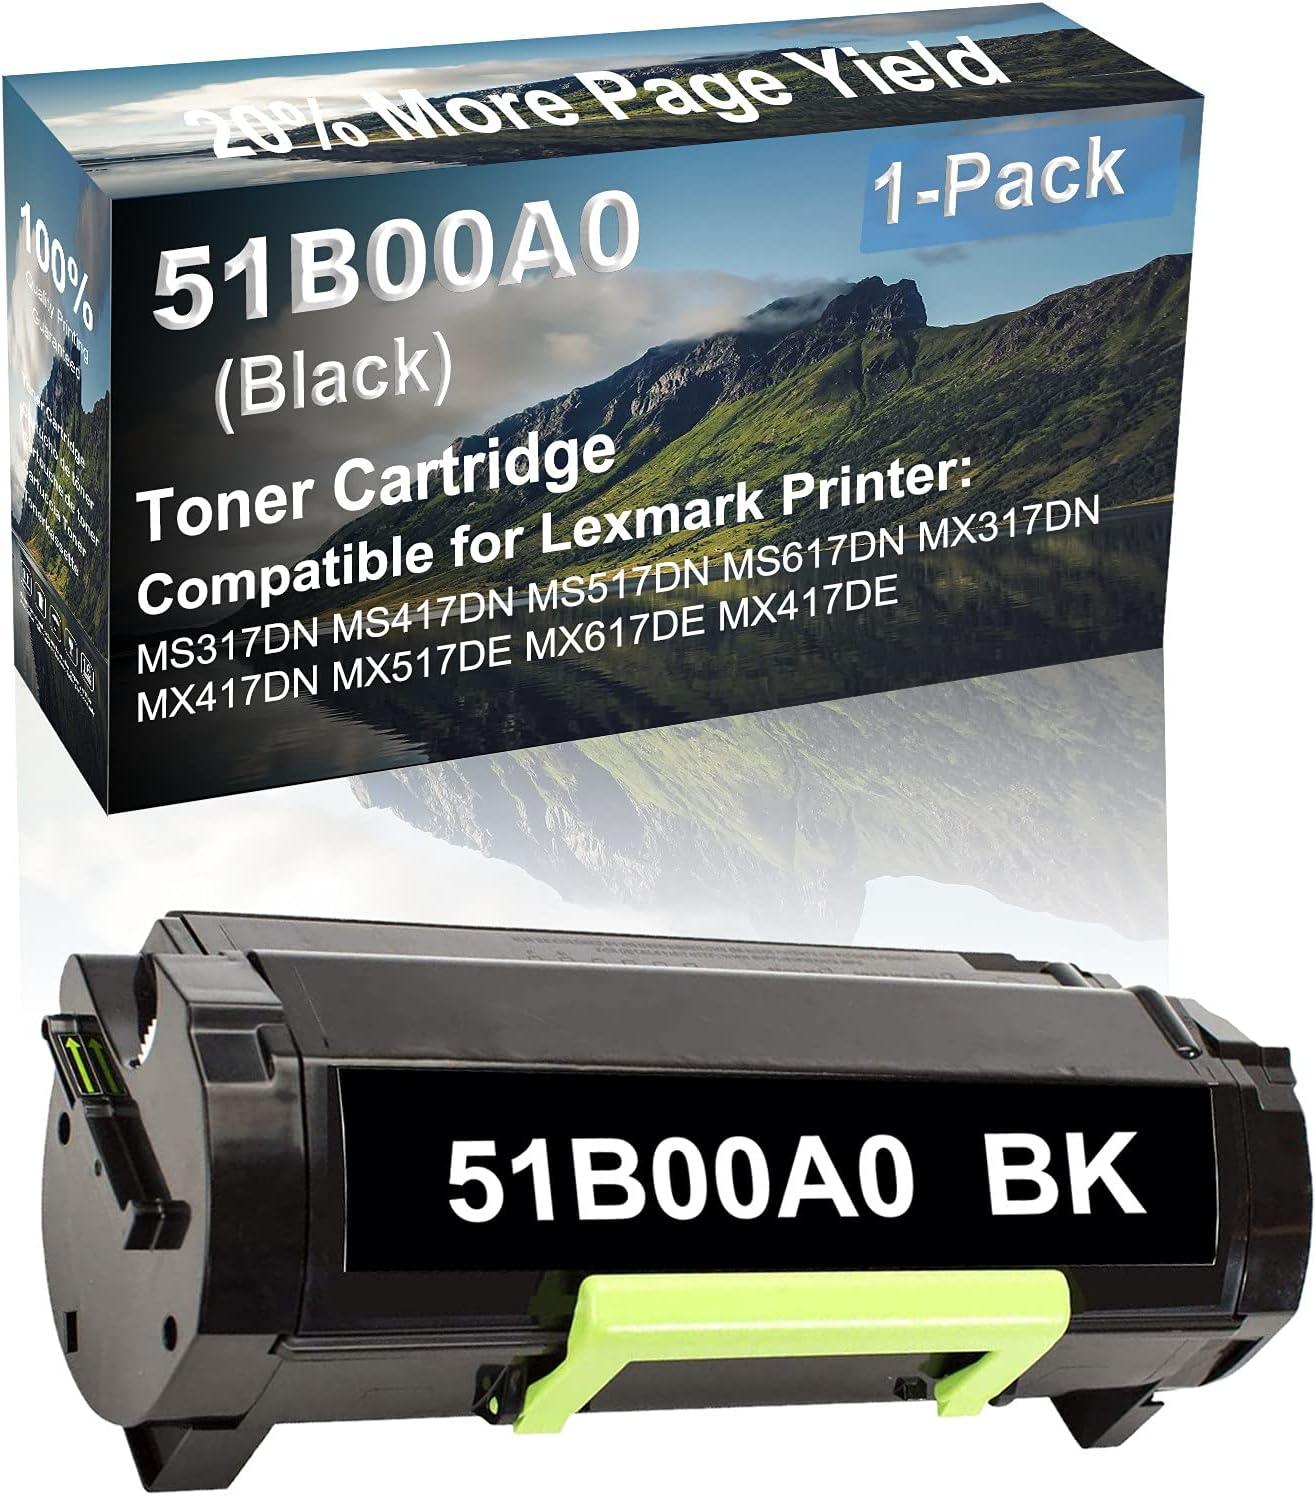 1-Pack Compatible High Capacity MS617DN MX317DN MX417DN Printer Toner Cartridge Replacement for Lexmark 51B00A0 Toner Cartridge (Black)